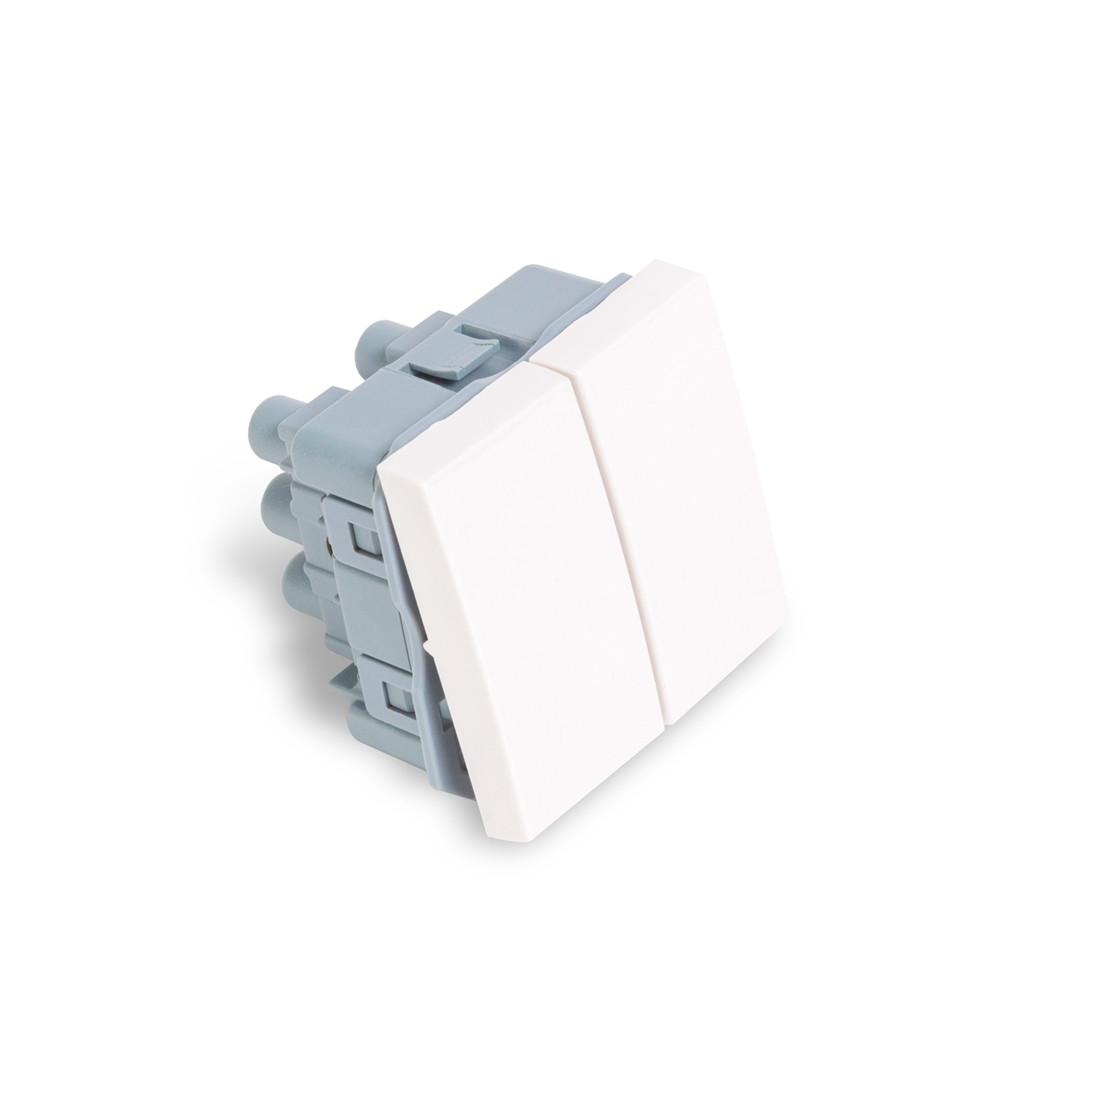 Выключатель модульный двуклавишный Рувинил АДЛ 13-905 45х45 мм Белый